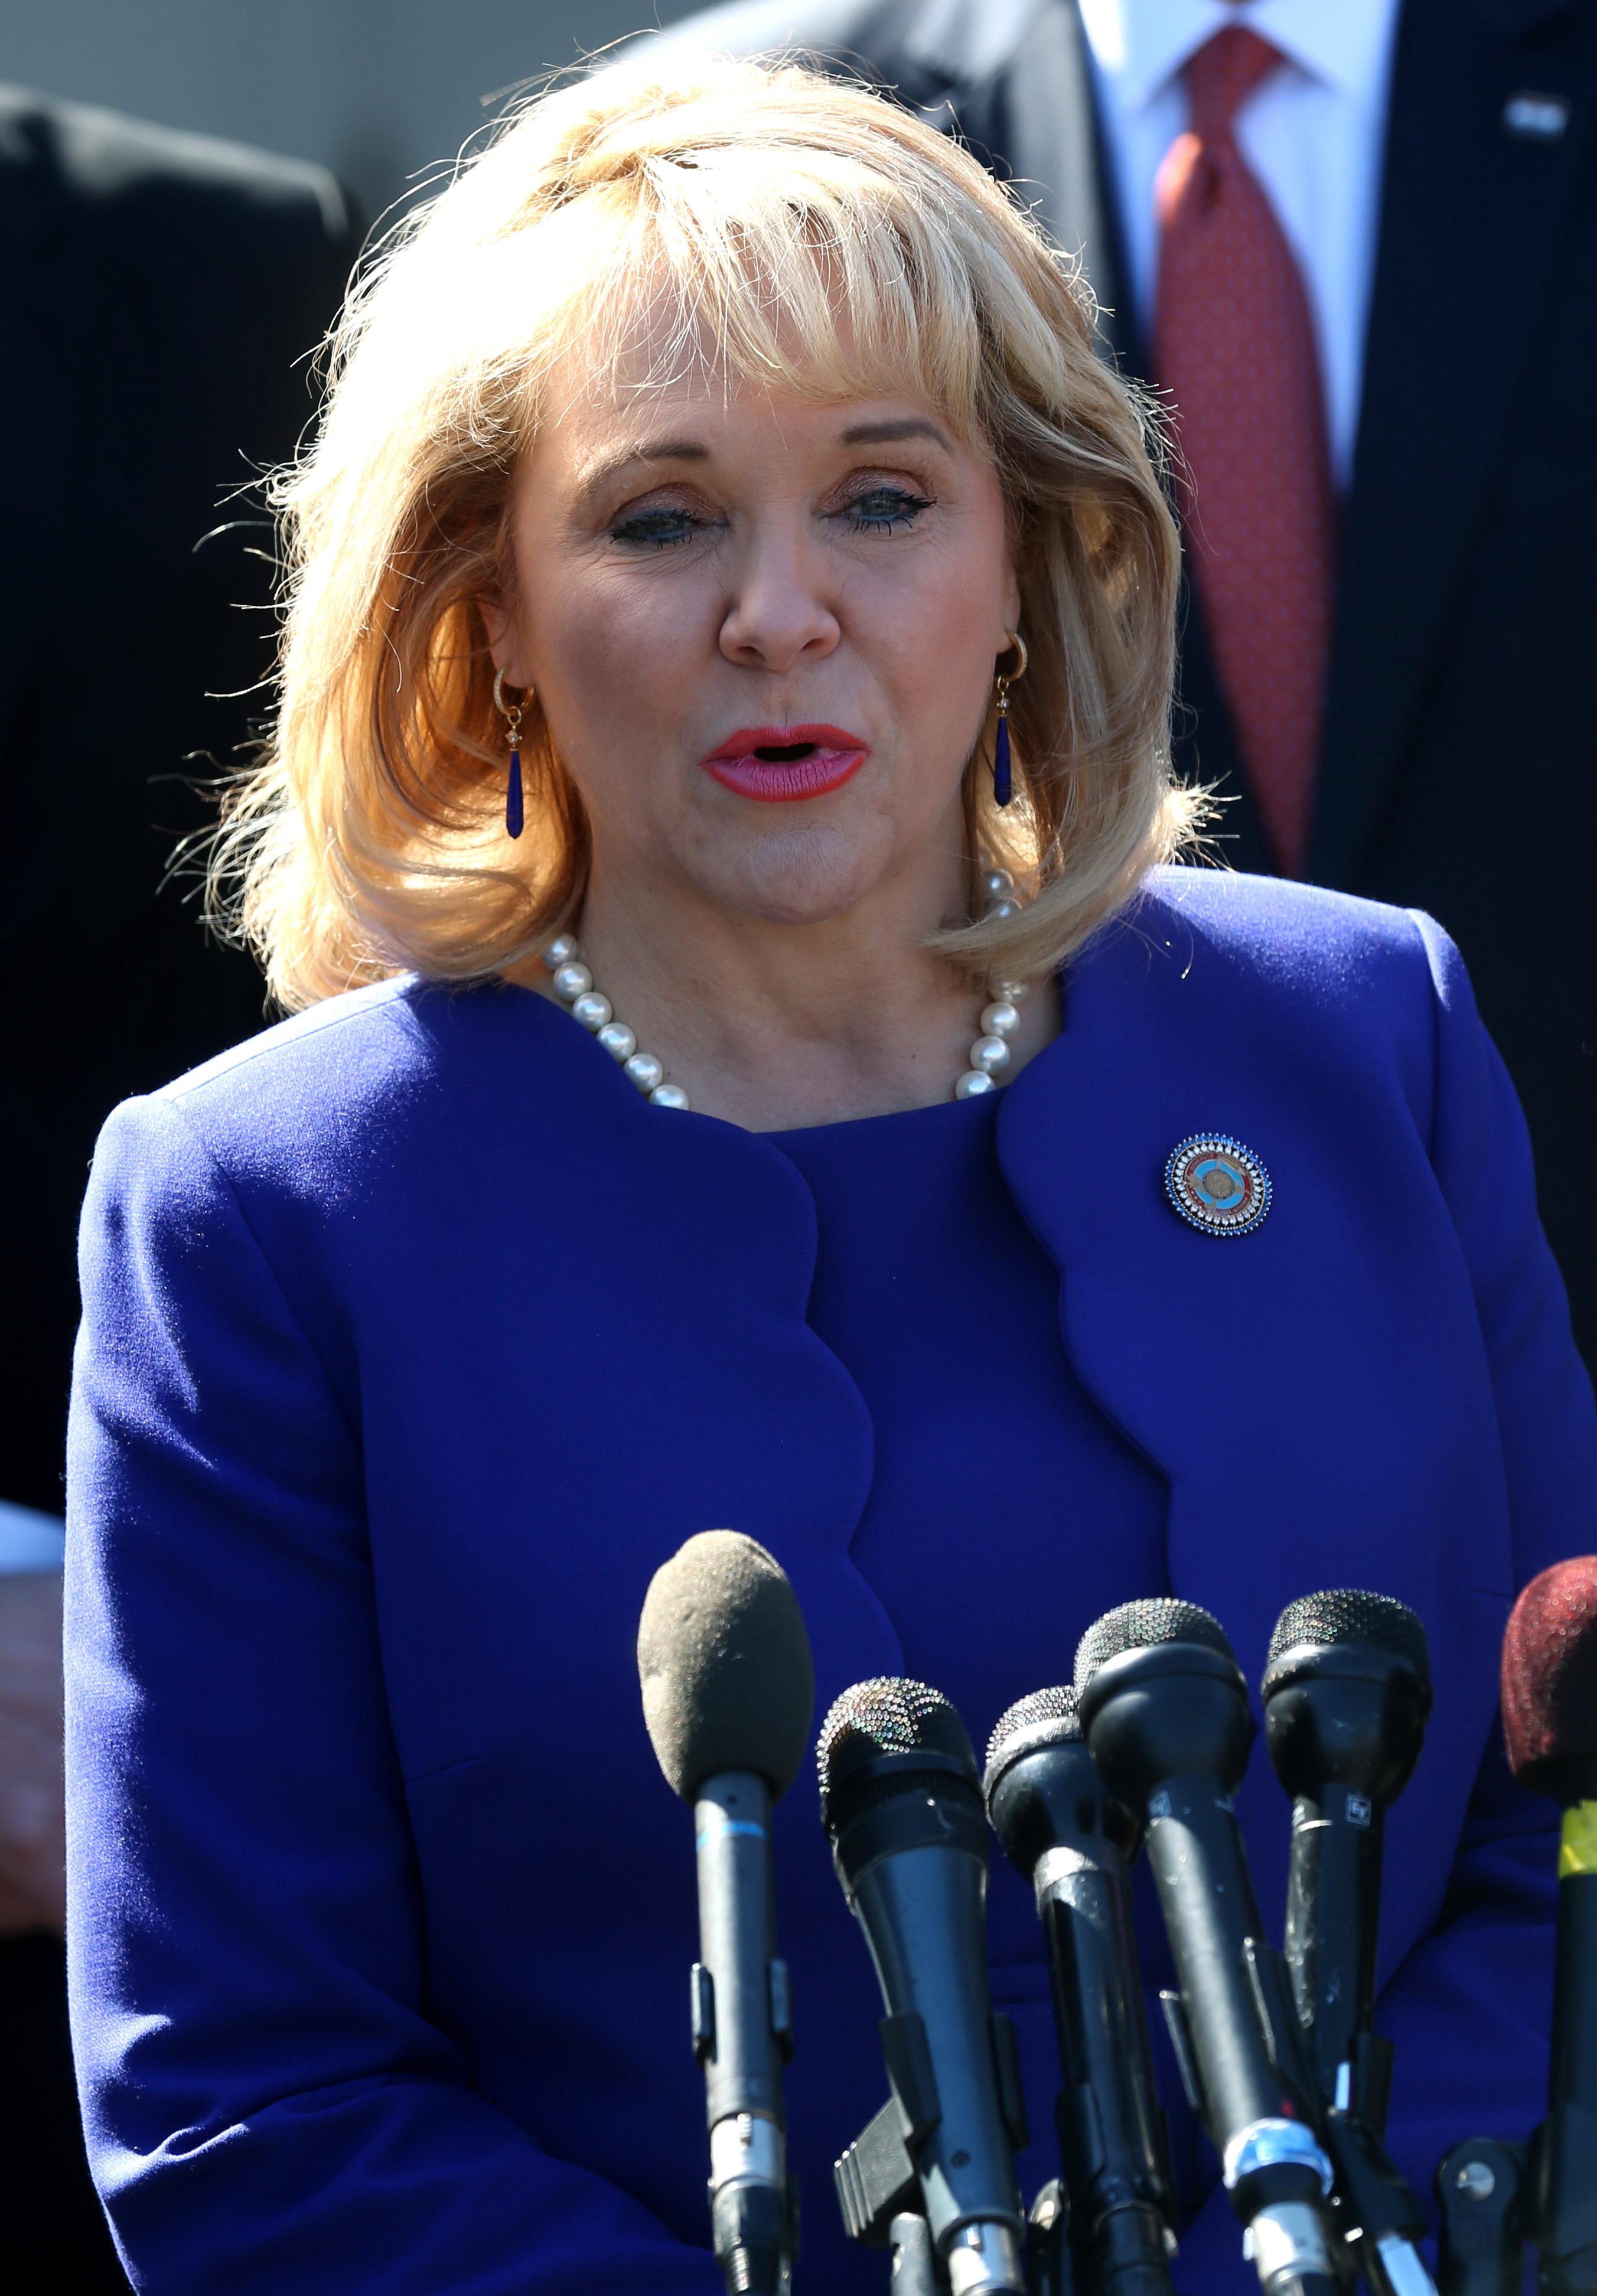 Gov. Mary Fallin on February 24, 2014 in Washington, DC.